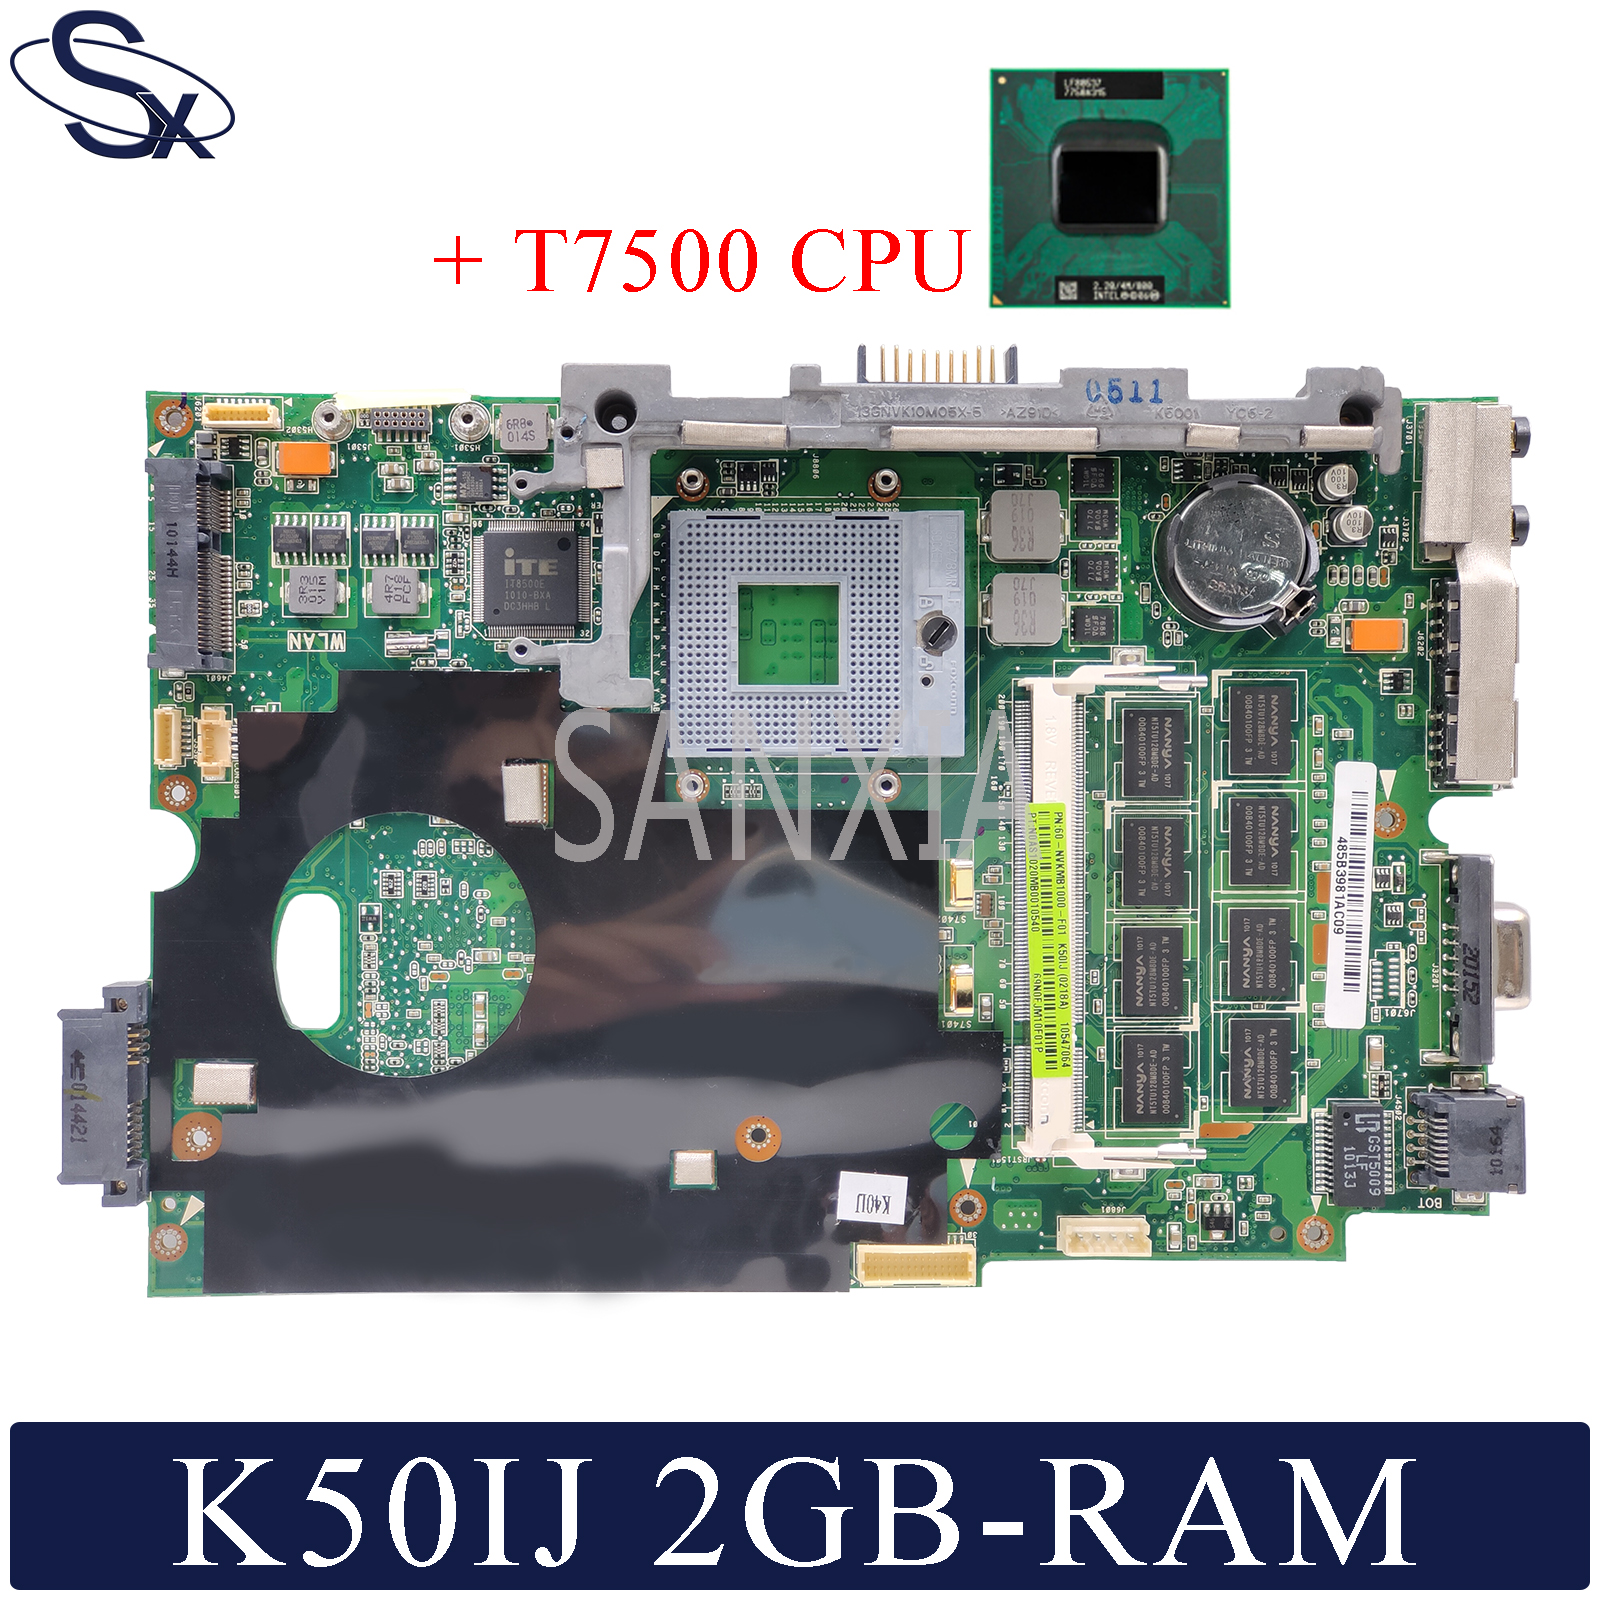 KEFU K50IJ Laptop motherboard for ASUS K40IJ K60IJ X5DIJ P81IJ P50IJ K40IN K50IN K40AB K50AB K50AF original mainboard 2G-RAM